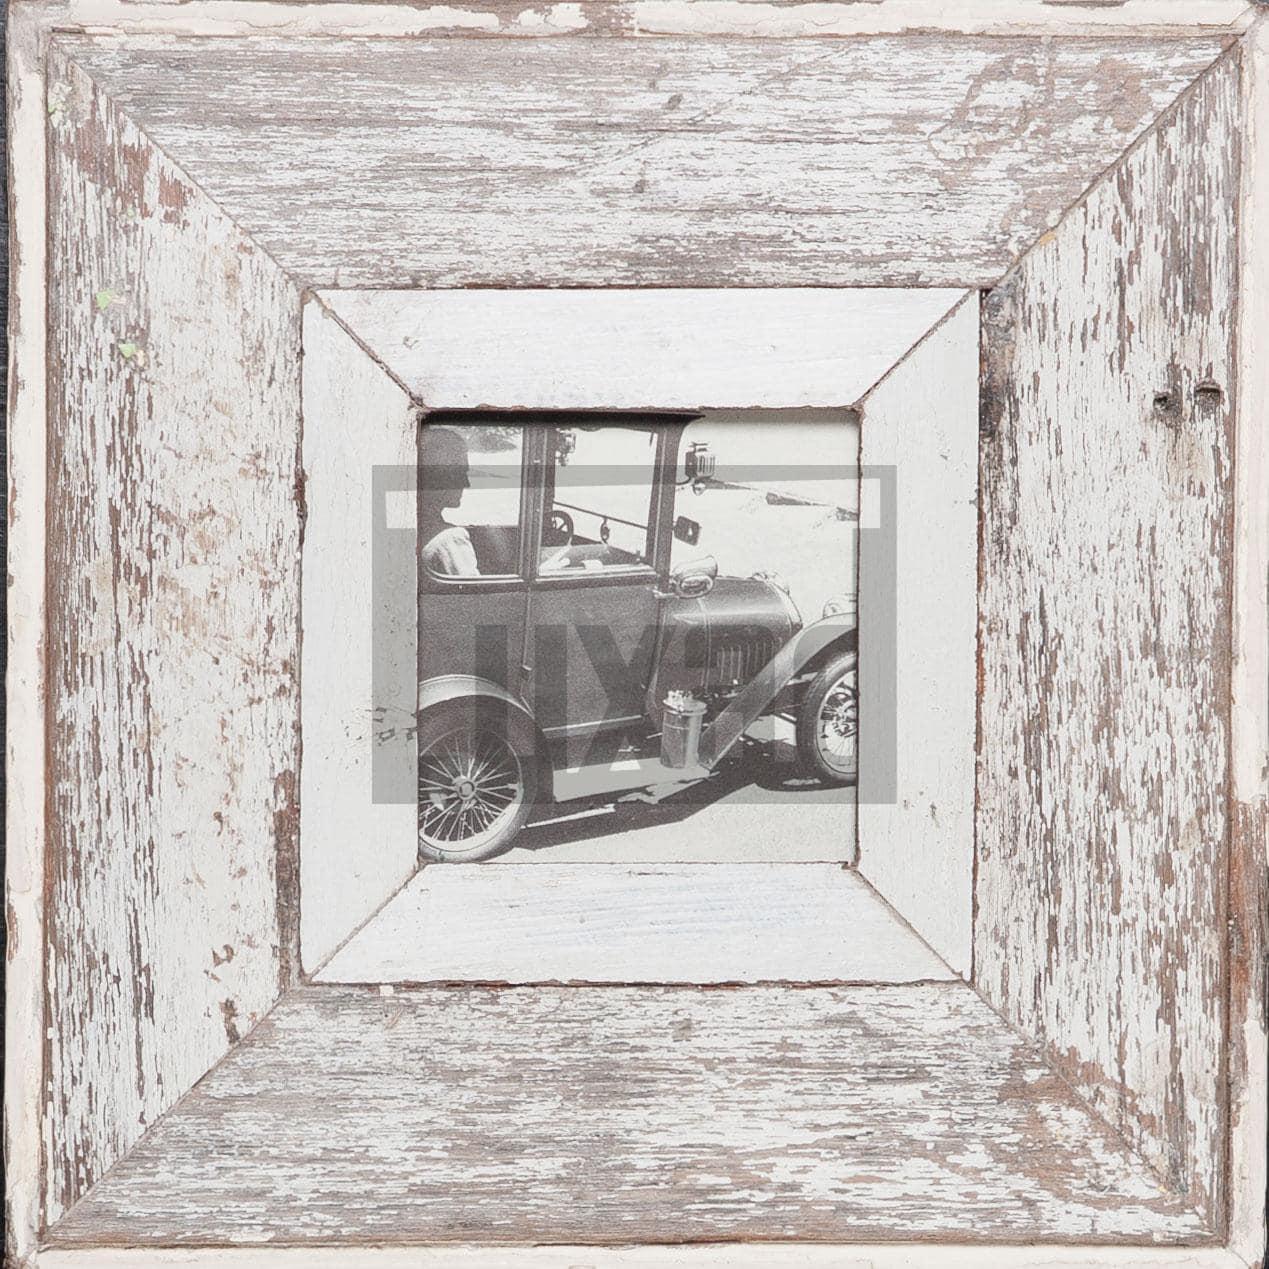 Quadratischer Vintage-Fotorahmen aus recyceltem Holz